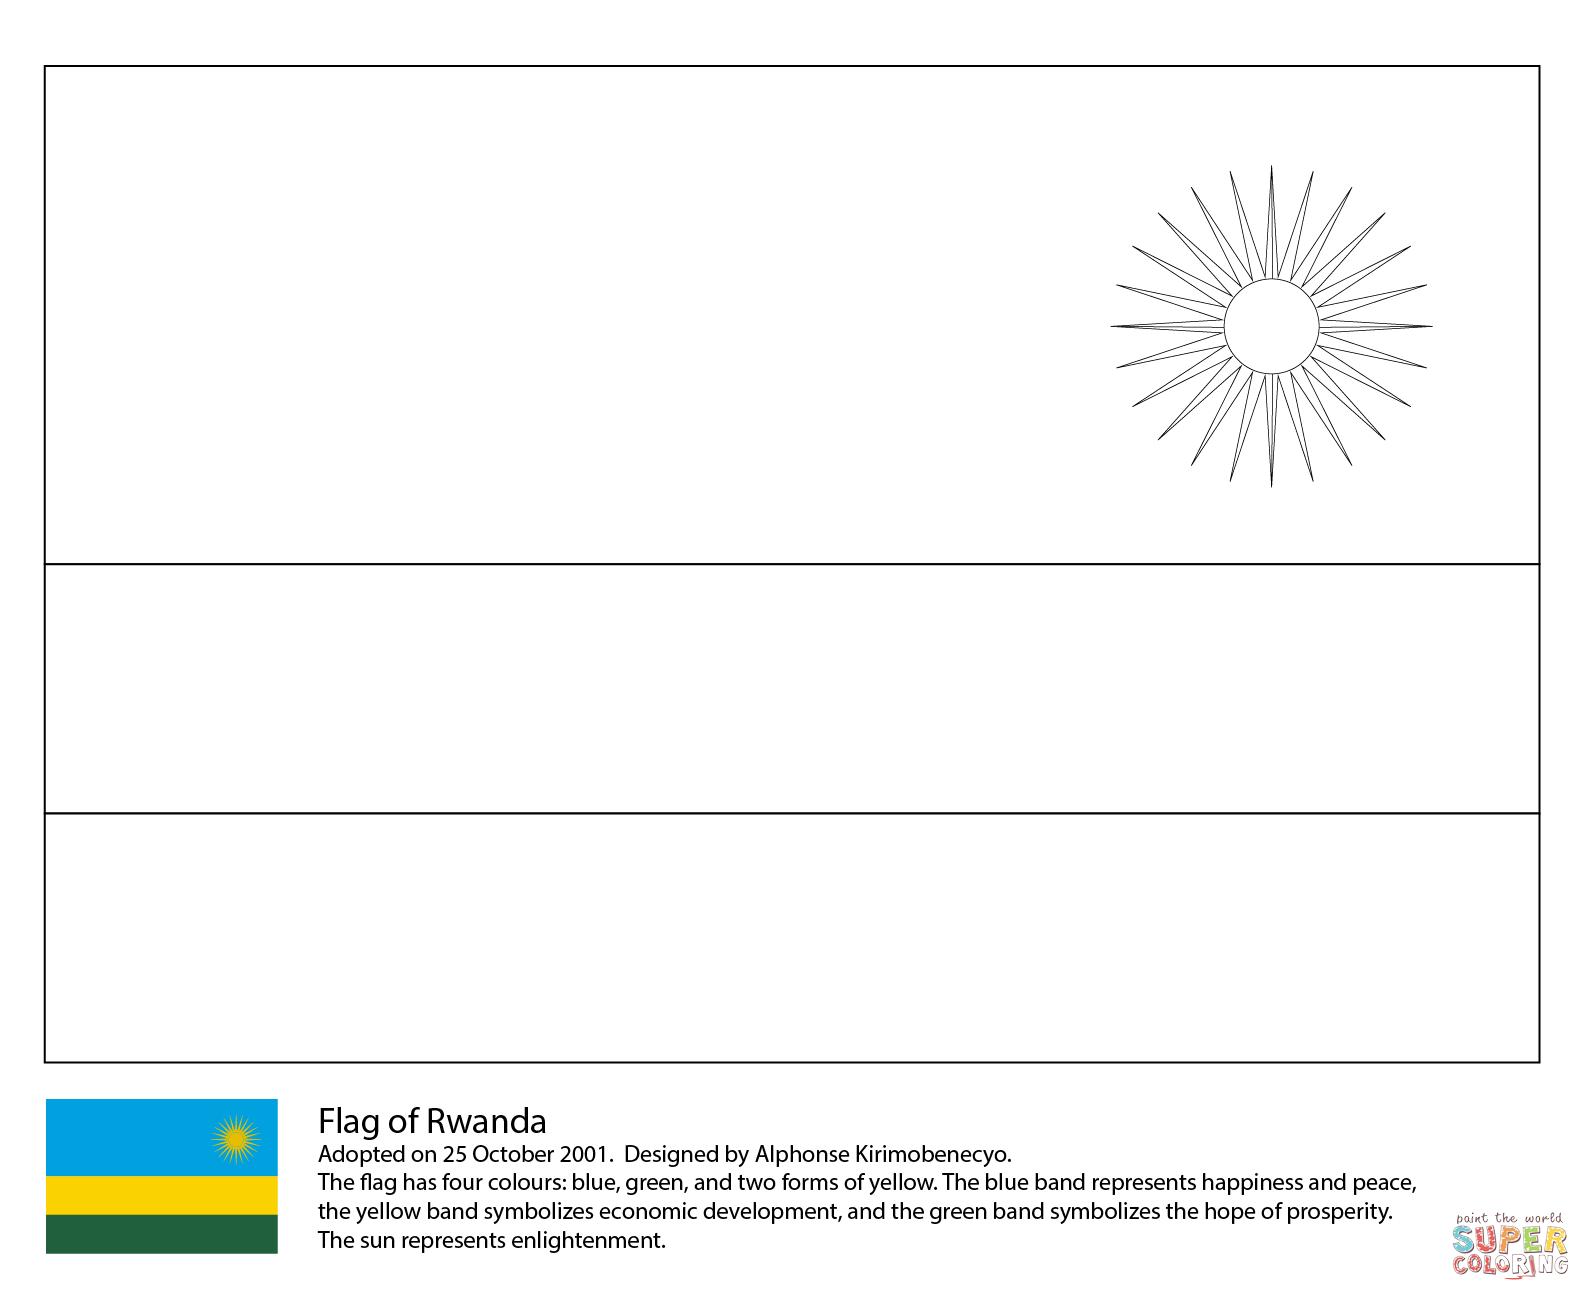 Flag Of Rwanda Coloring Page Free Printable Coloring Pages In 2020 Free Printable Coloring Coloring Pages Flag Coloring Pages